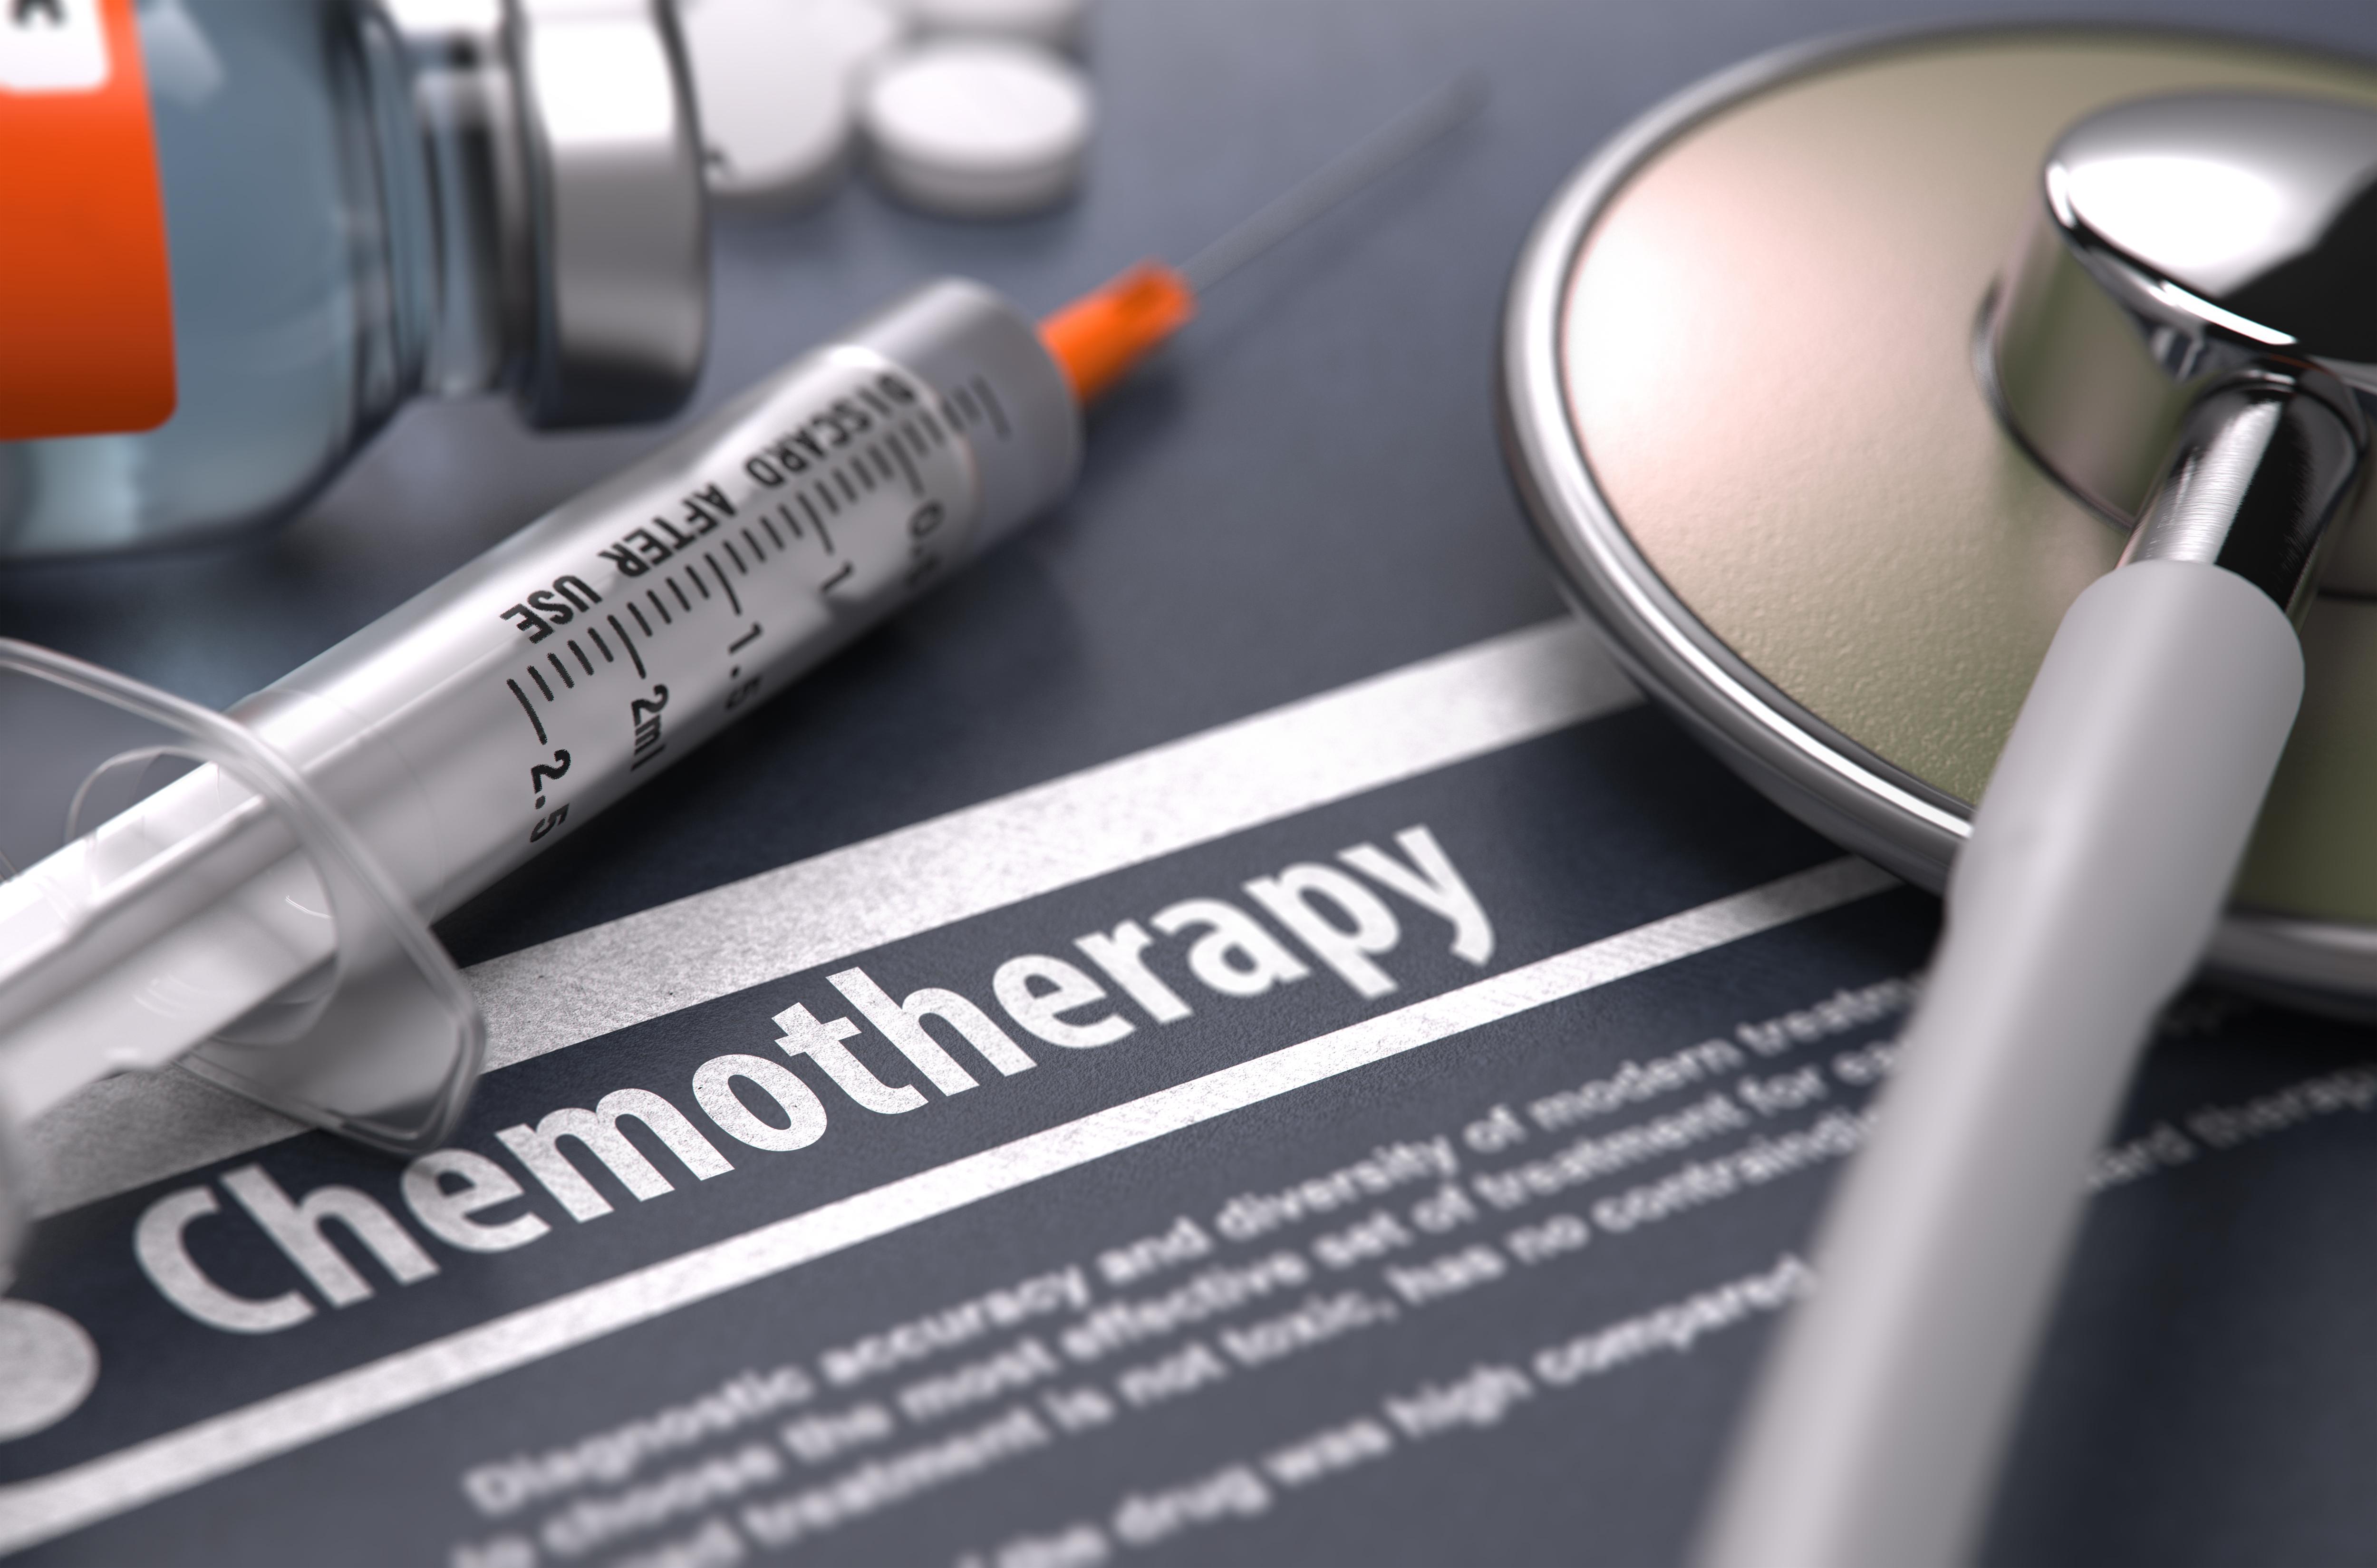 Chemotherapy and Marijuana Information: Treat Chemo Symptoms With Cannabis